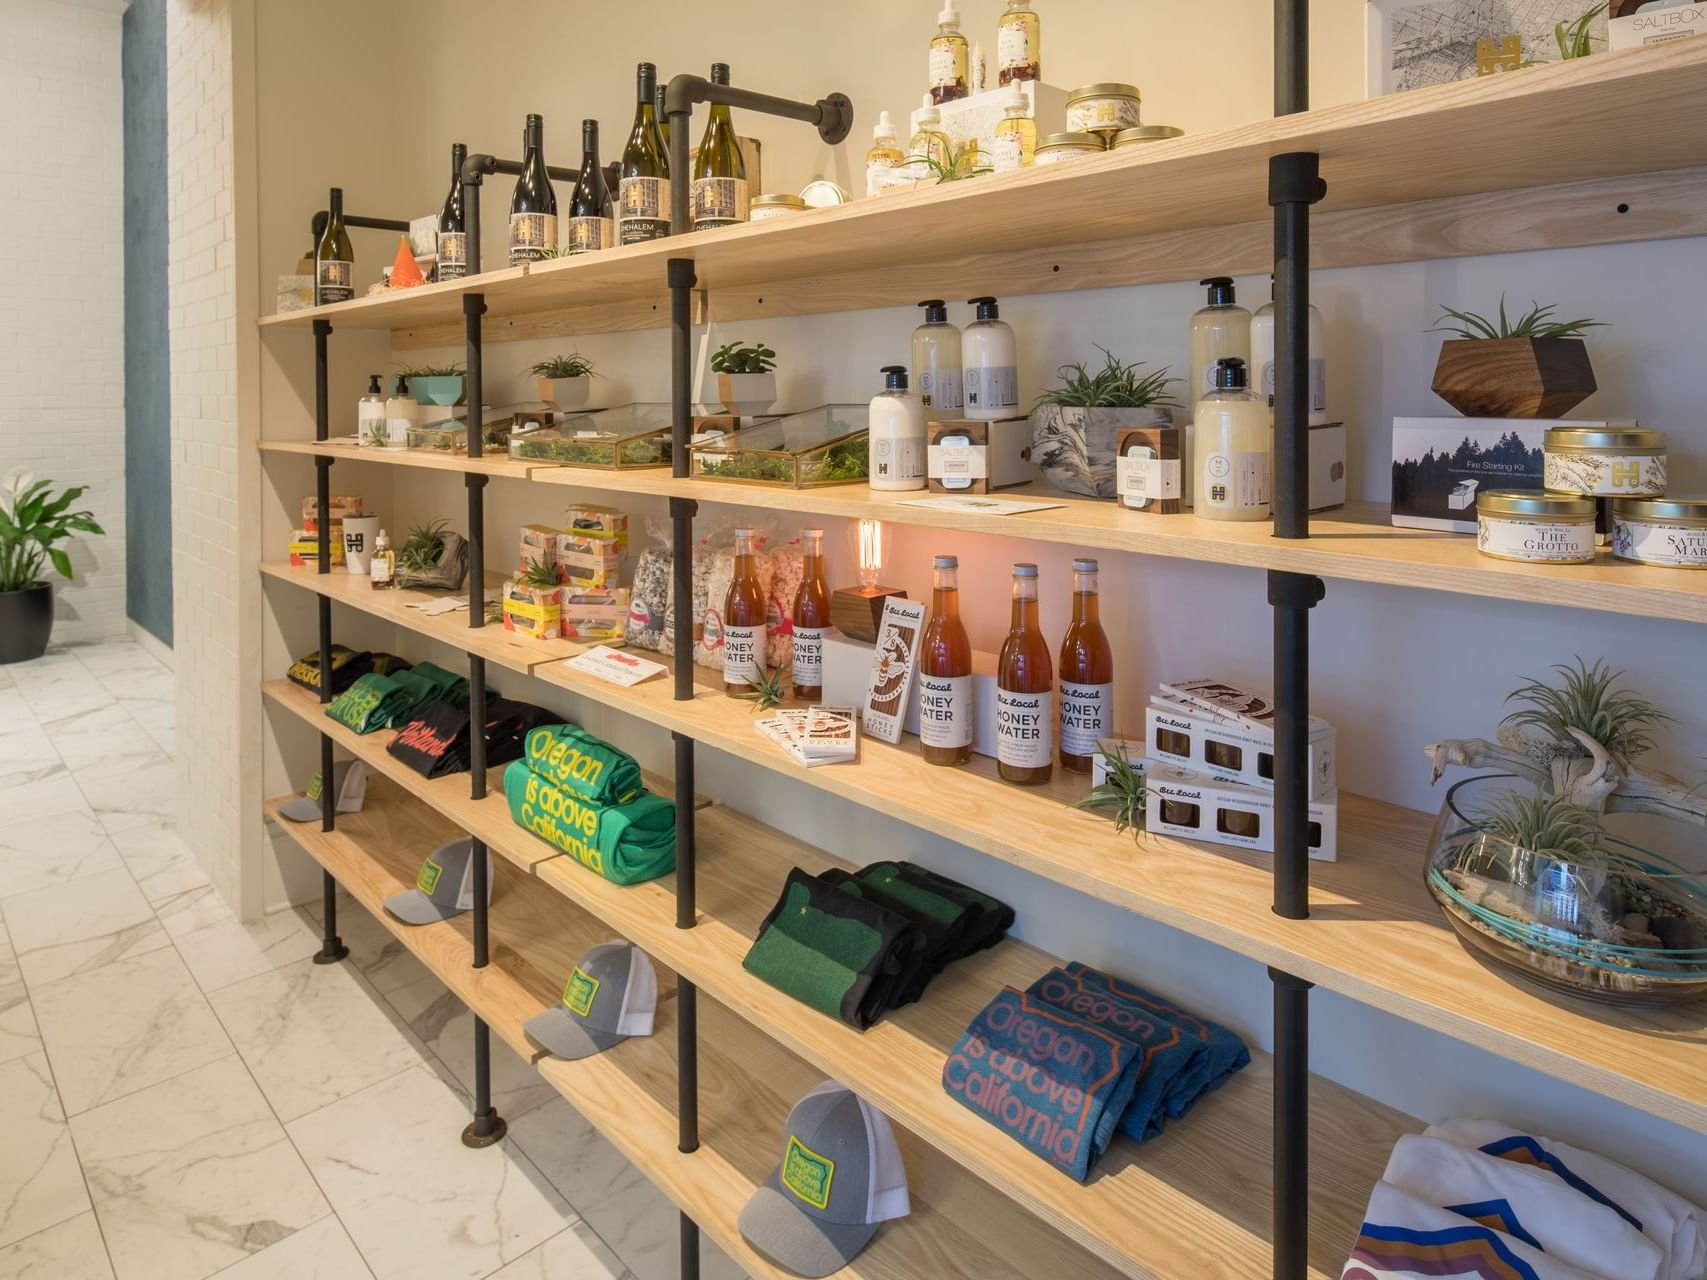 The Merchant product shelves